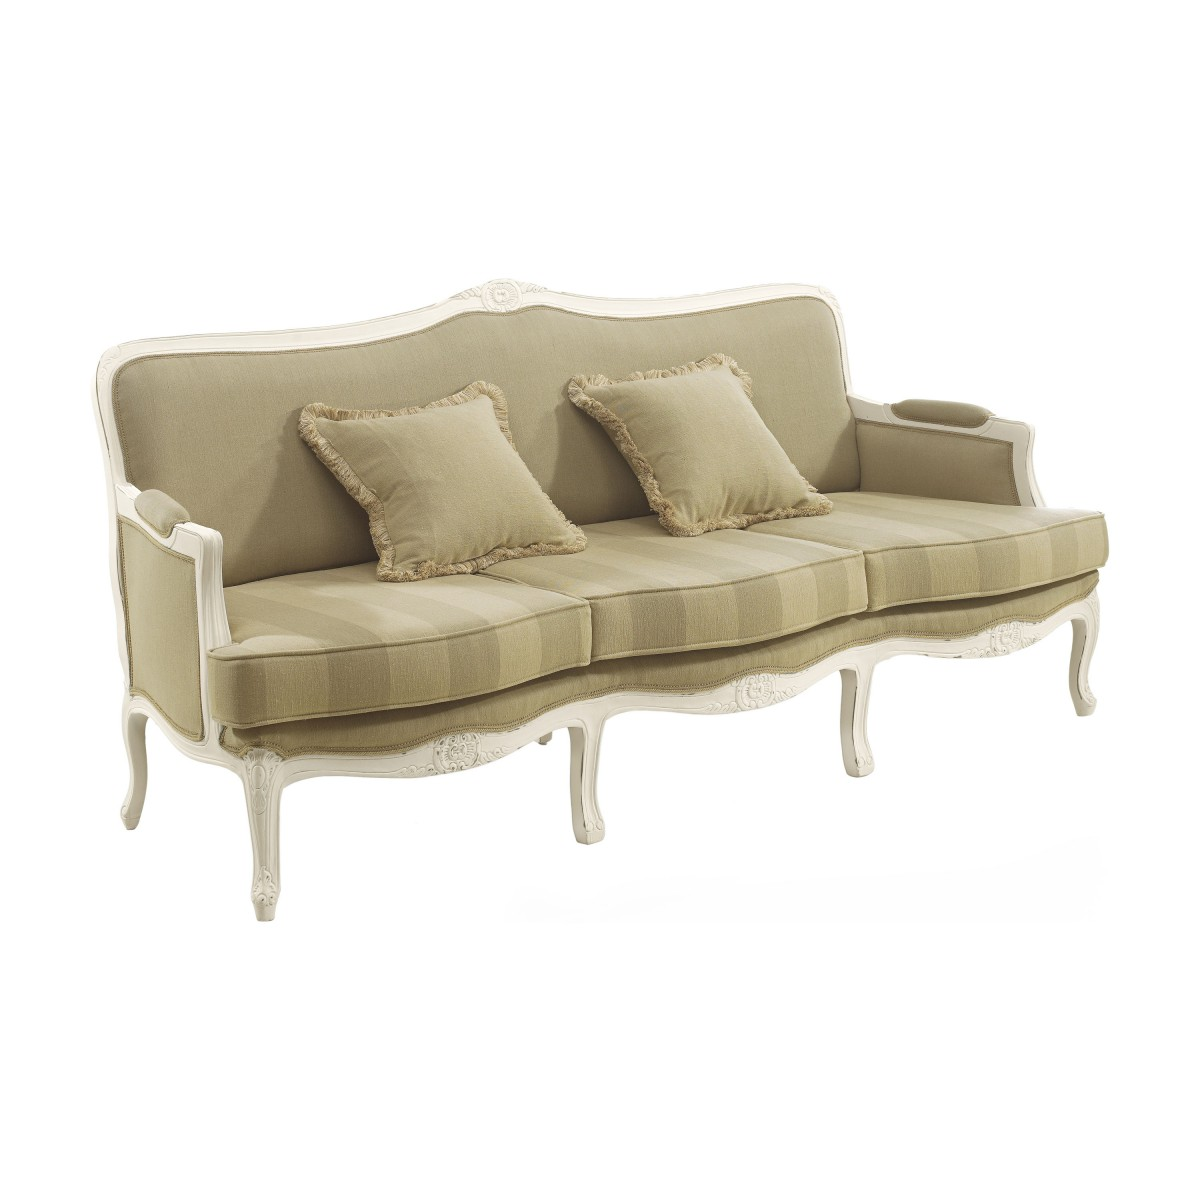 classic sofa cloe 5523